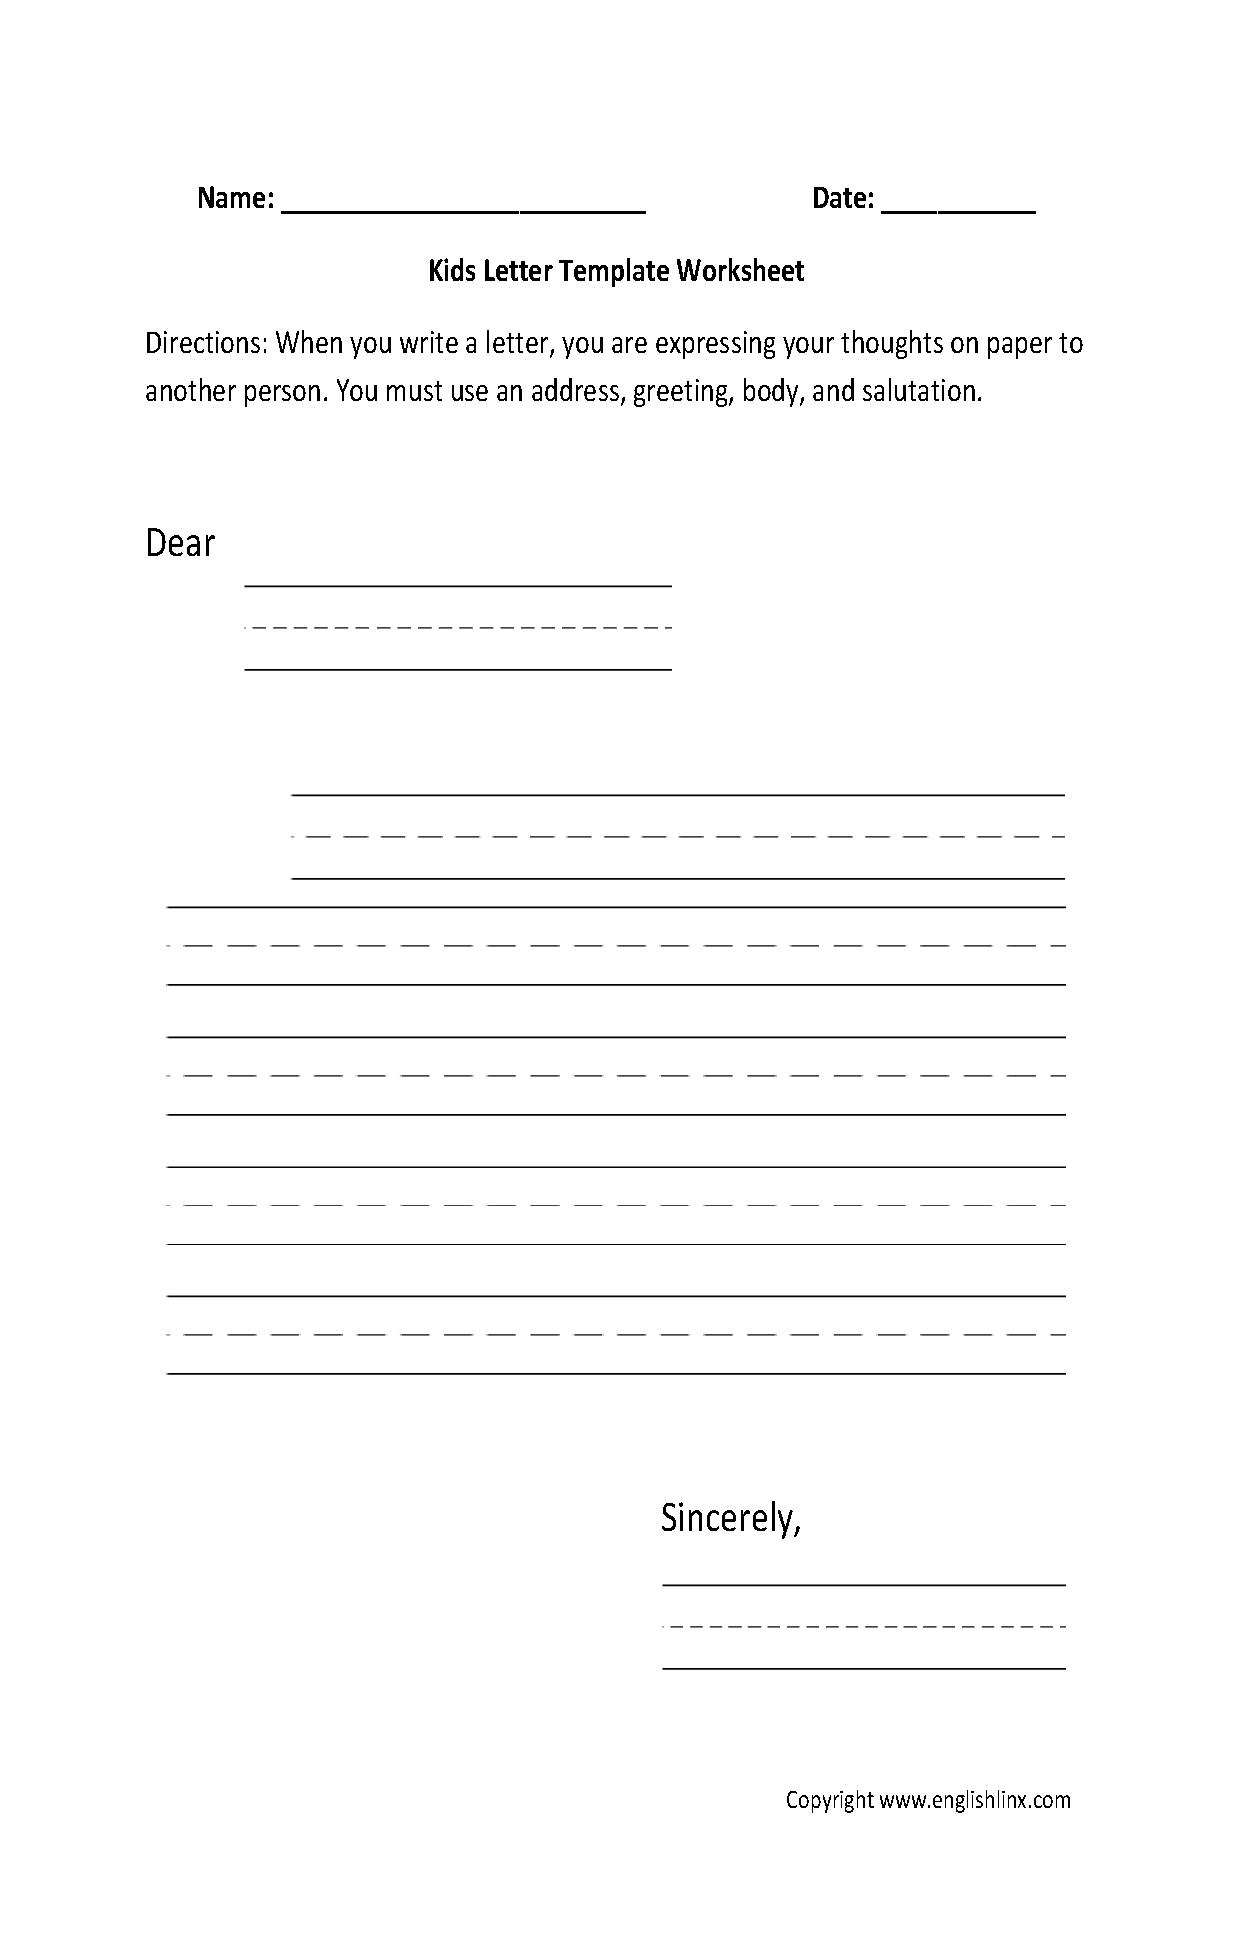 Writing Letters Worksheets For Kindergarten 456439